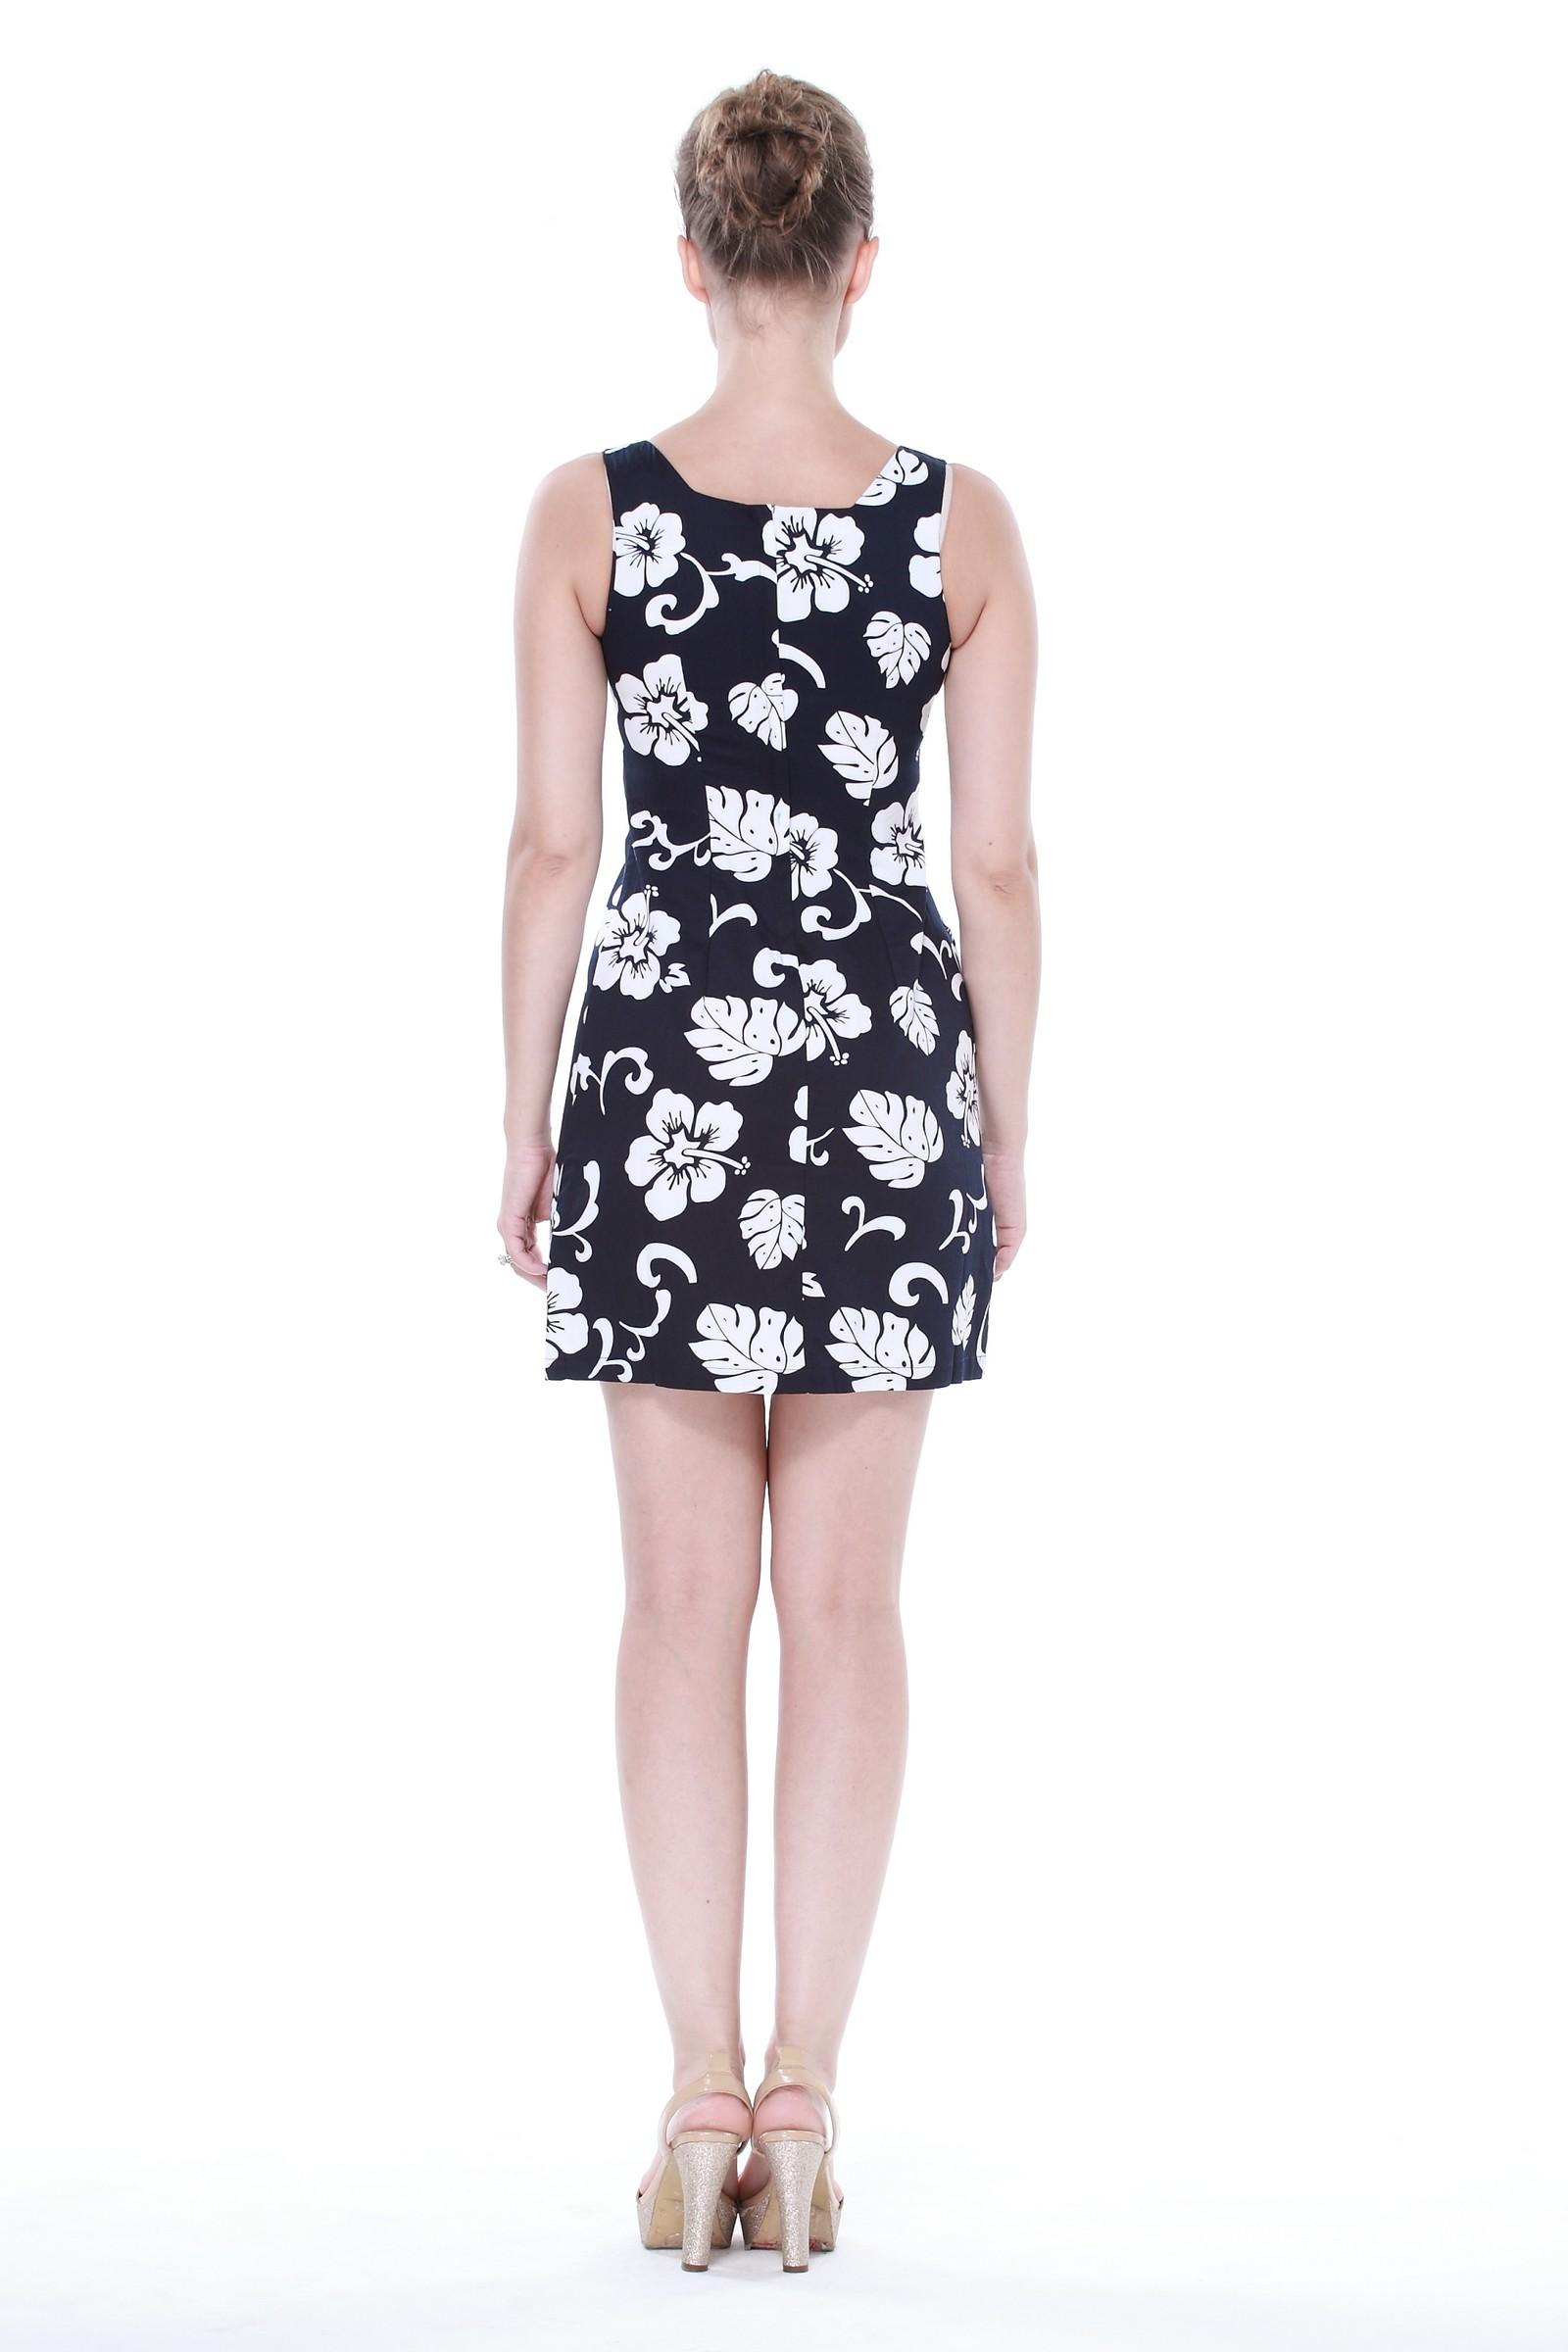 9477339d43 Hawaii Hangover - Matching Mother Daughter Hawaiian Luau Outfit Lady Tank  Dress Girl Dress PW Navy Hibiscus XL-8 - Walmart.com